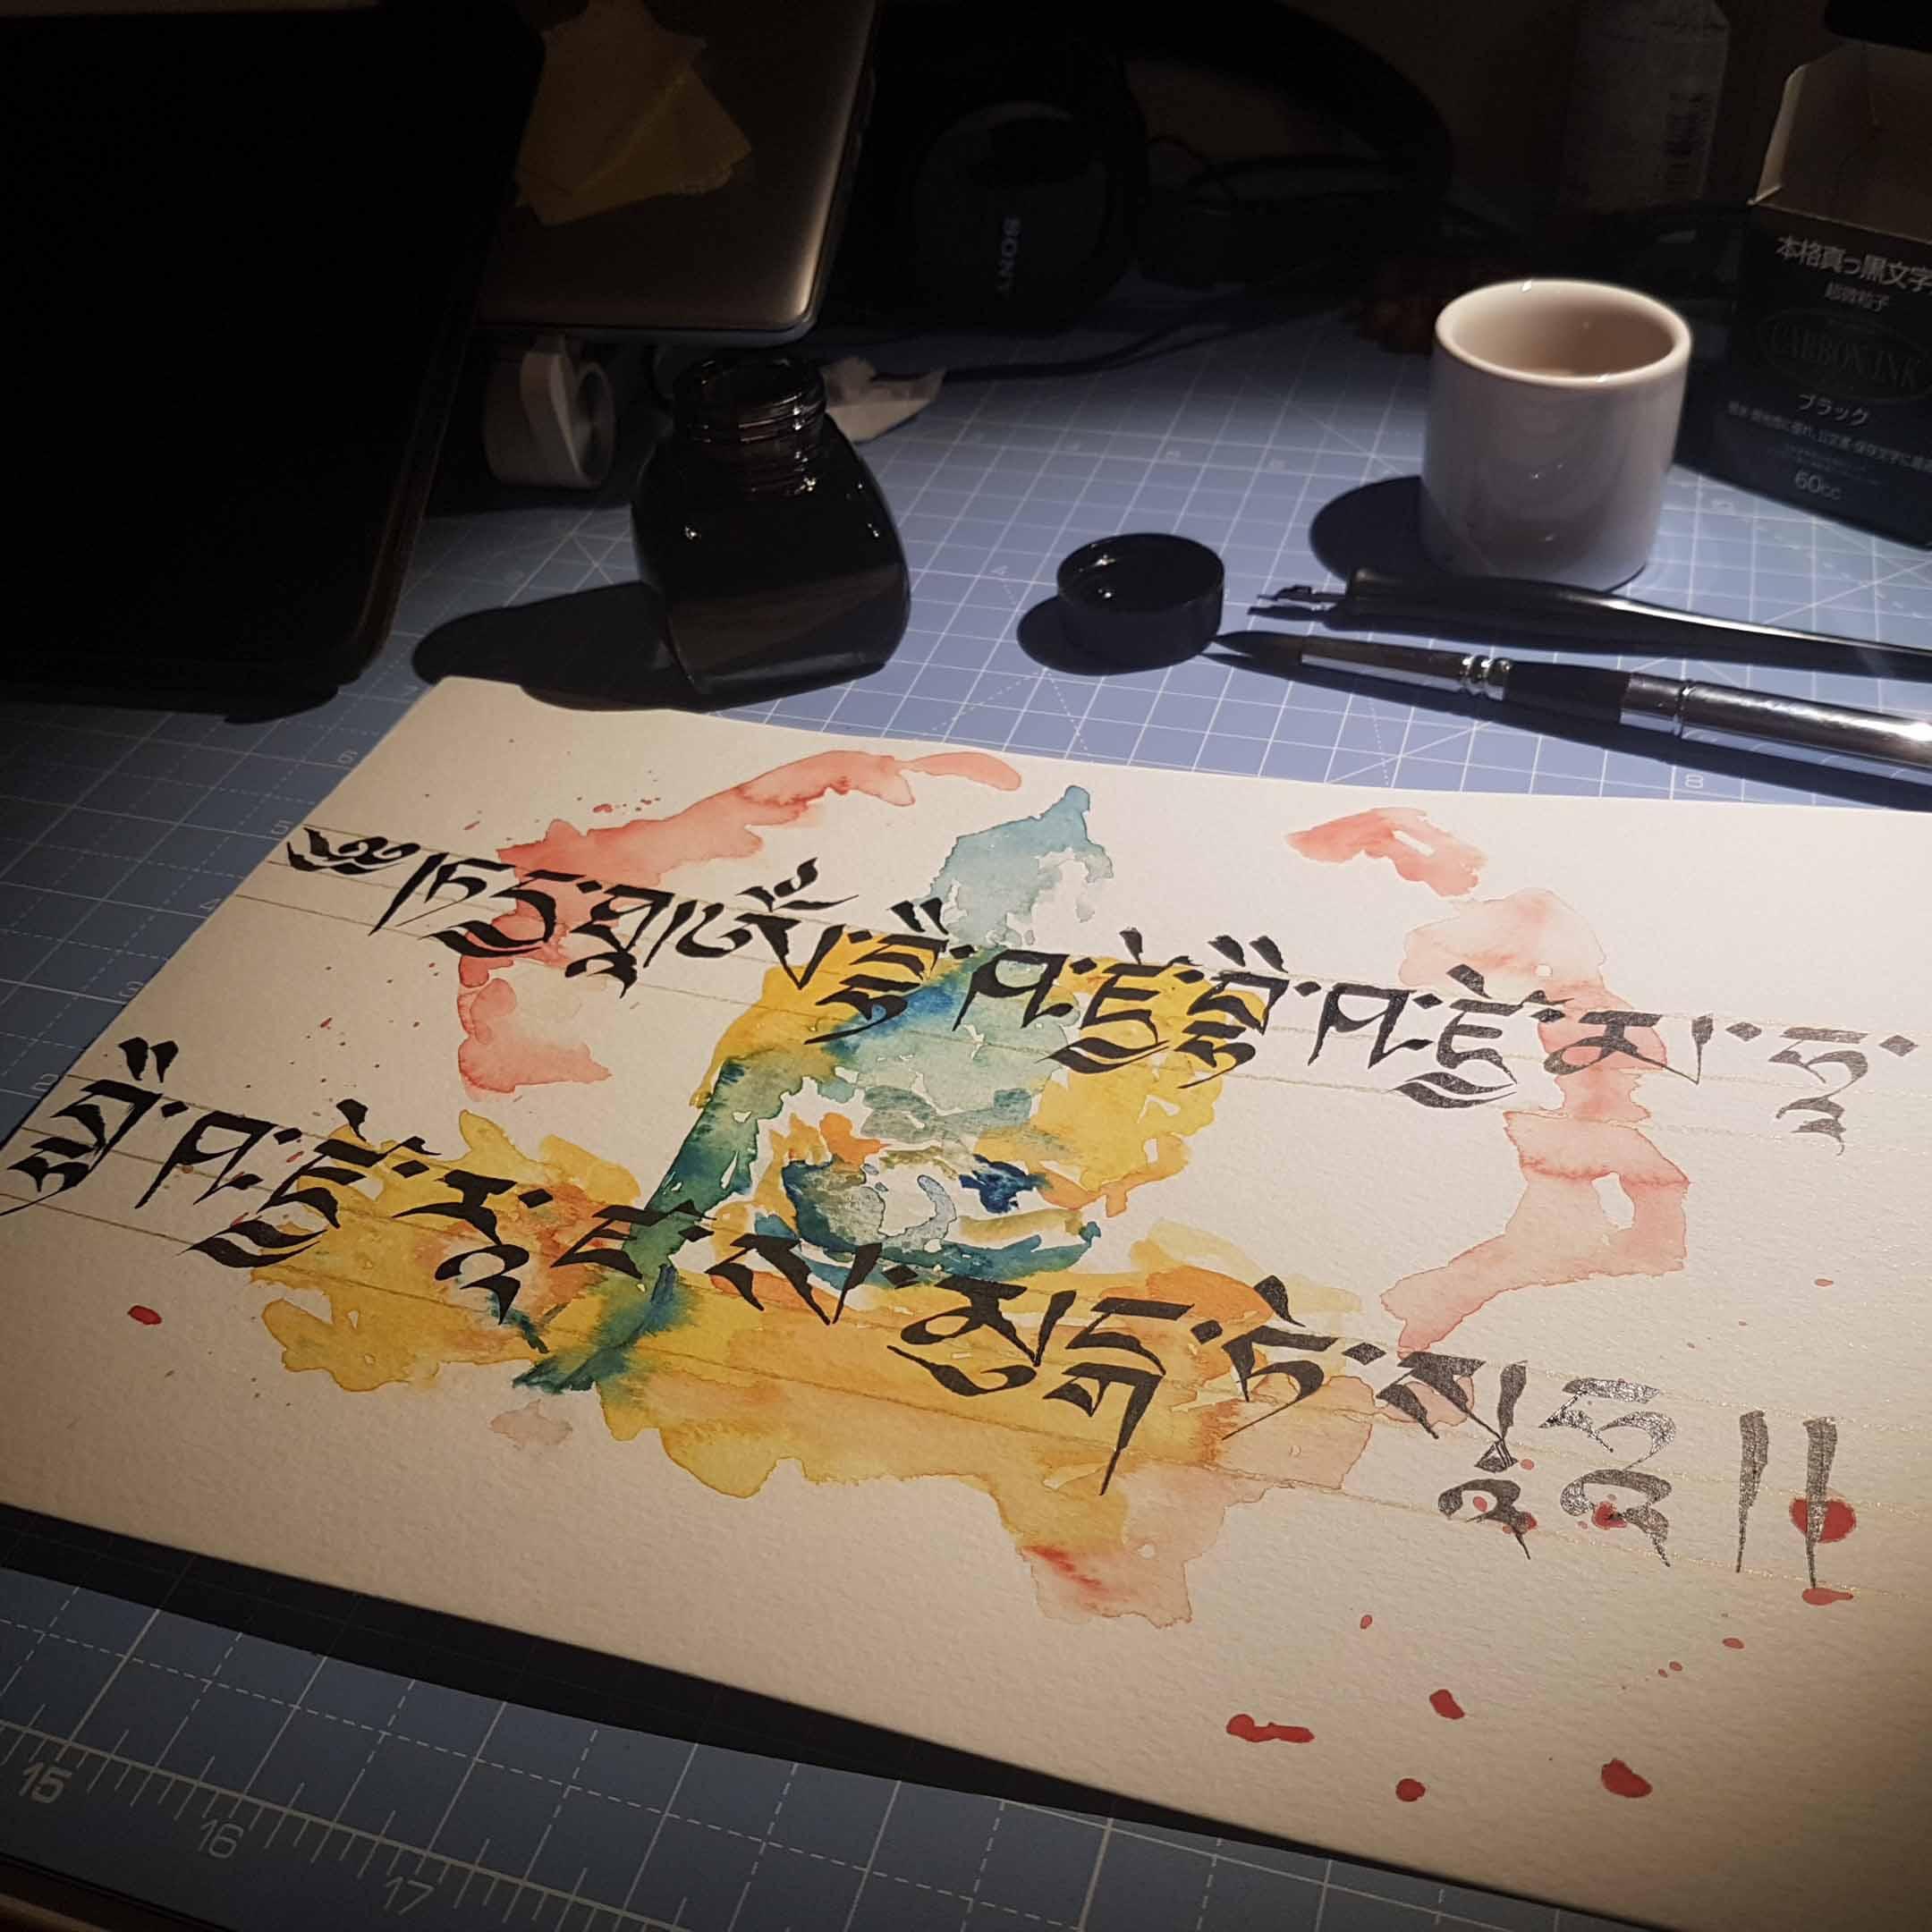 calligrafia tibetana mantra budda della medicina